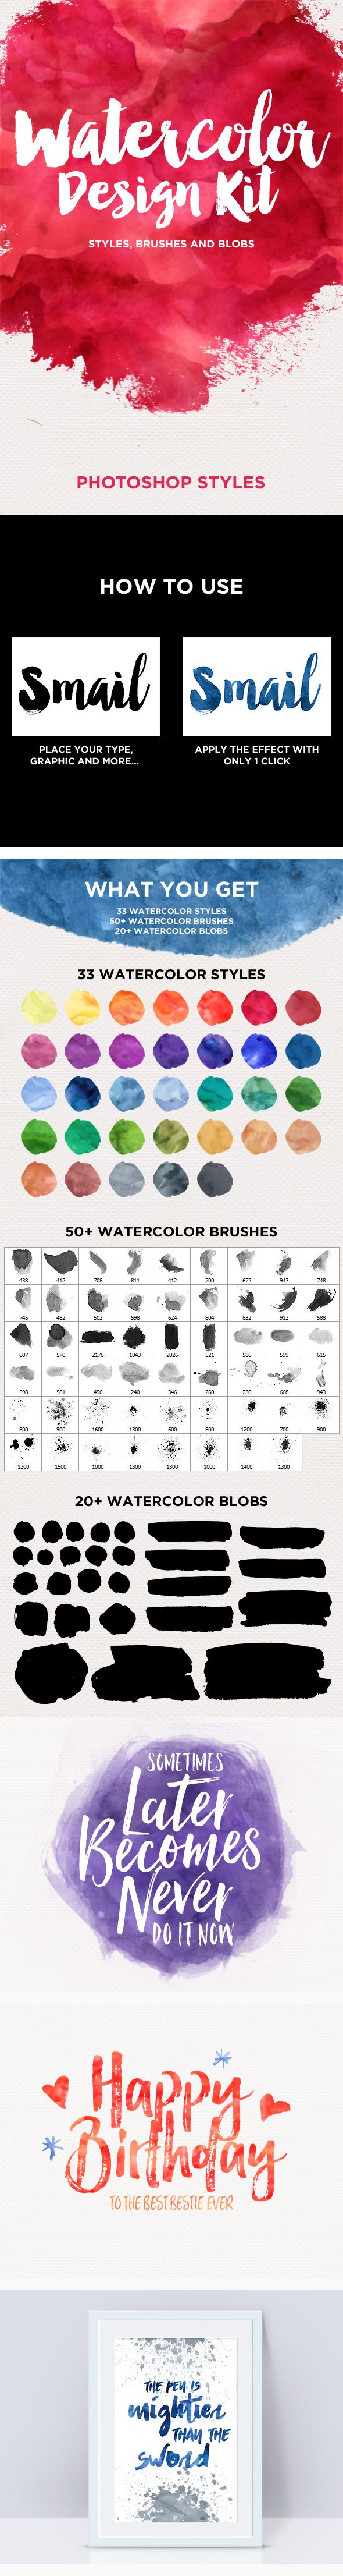 Poster design kit - Watercolor Design Kit Photoshop Styles